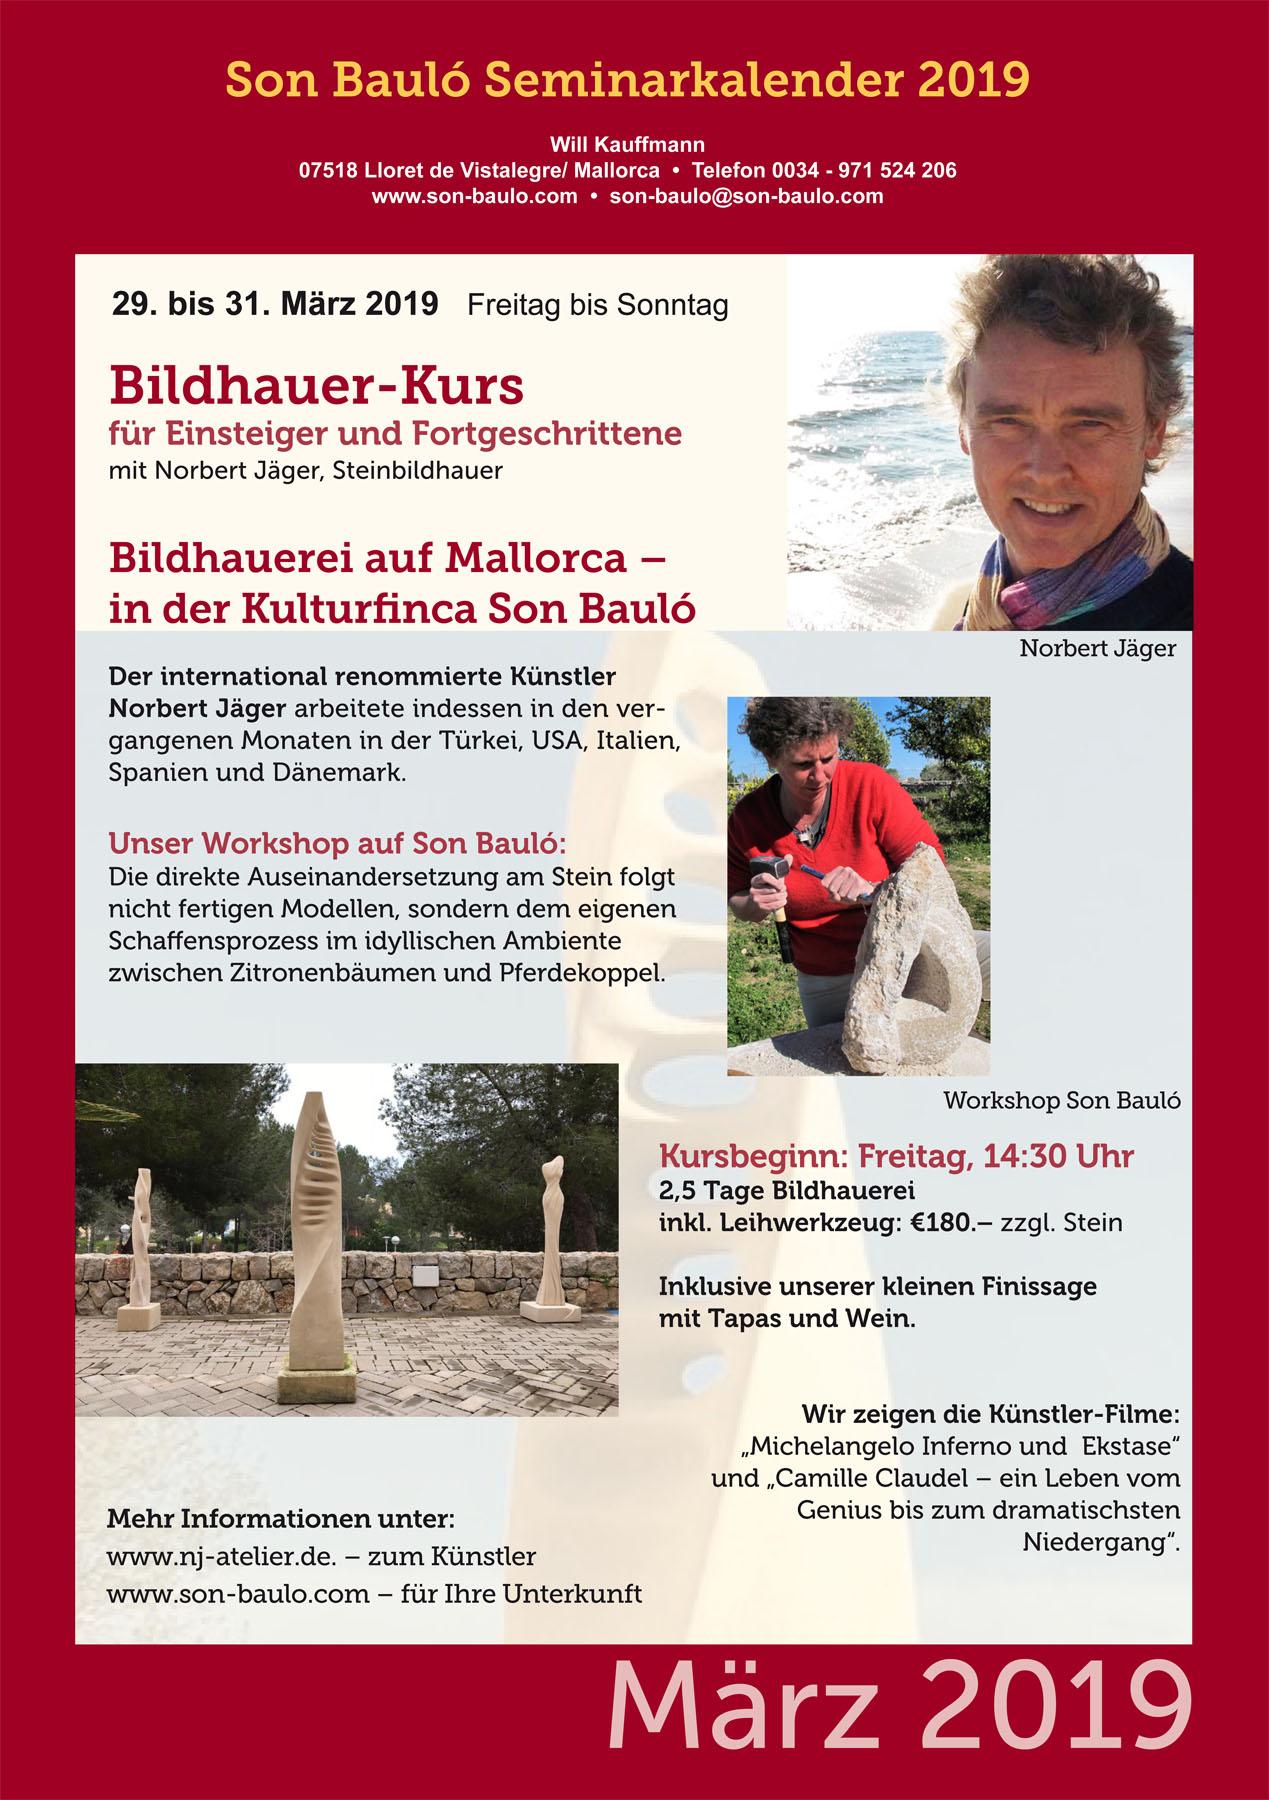 Bildhauer-Kurs mit Norbert Jäger, 29.03-31.03. @ Kulturfinca Son Bauló | Illes Balears | Spanien